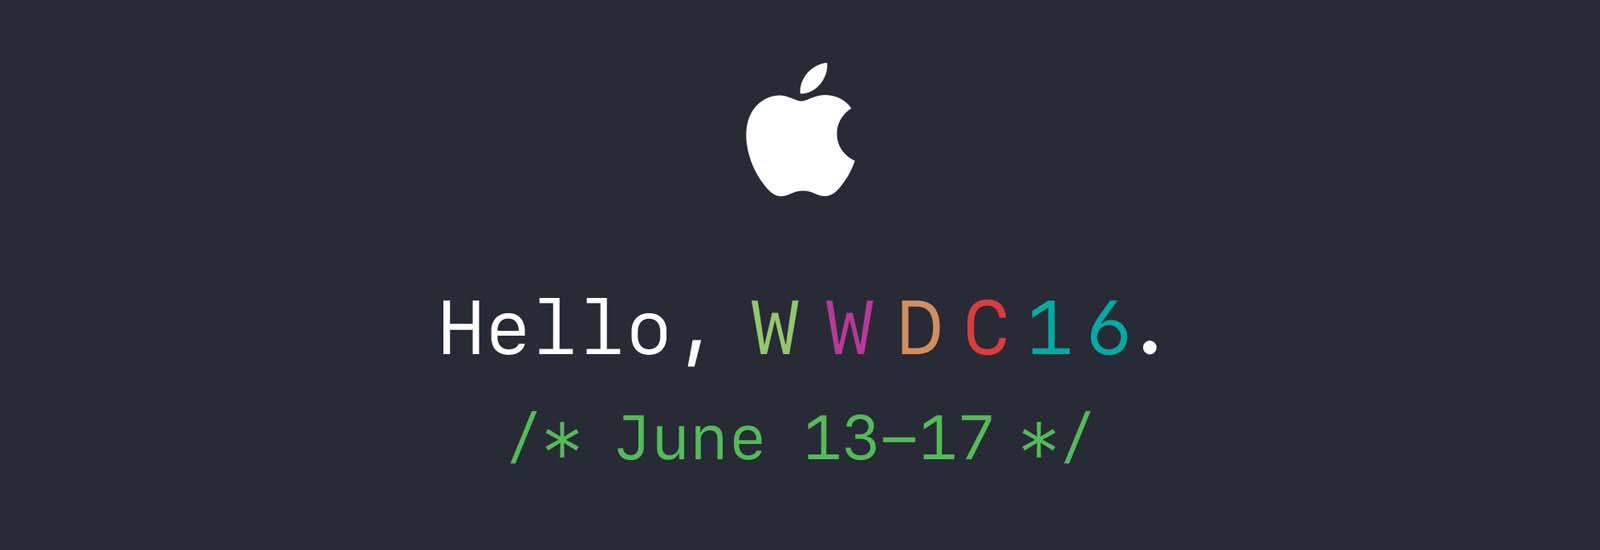 Live fra WWDC 2016